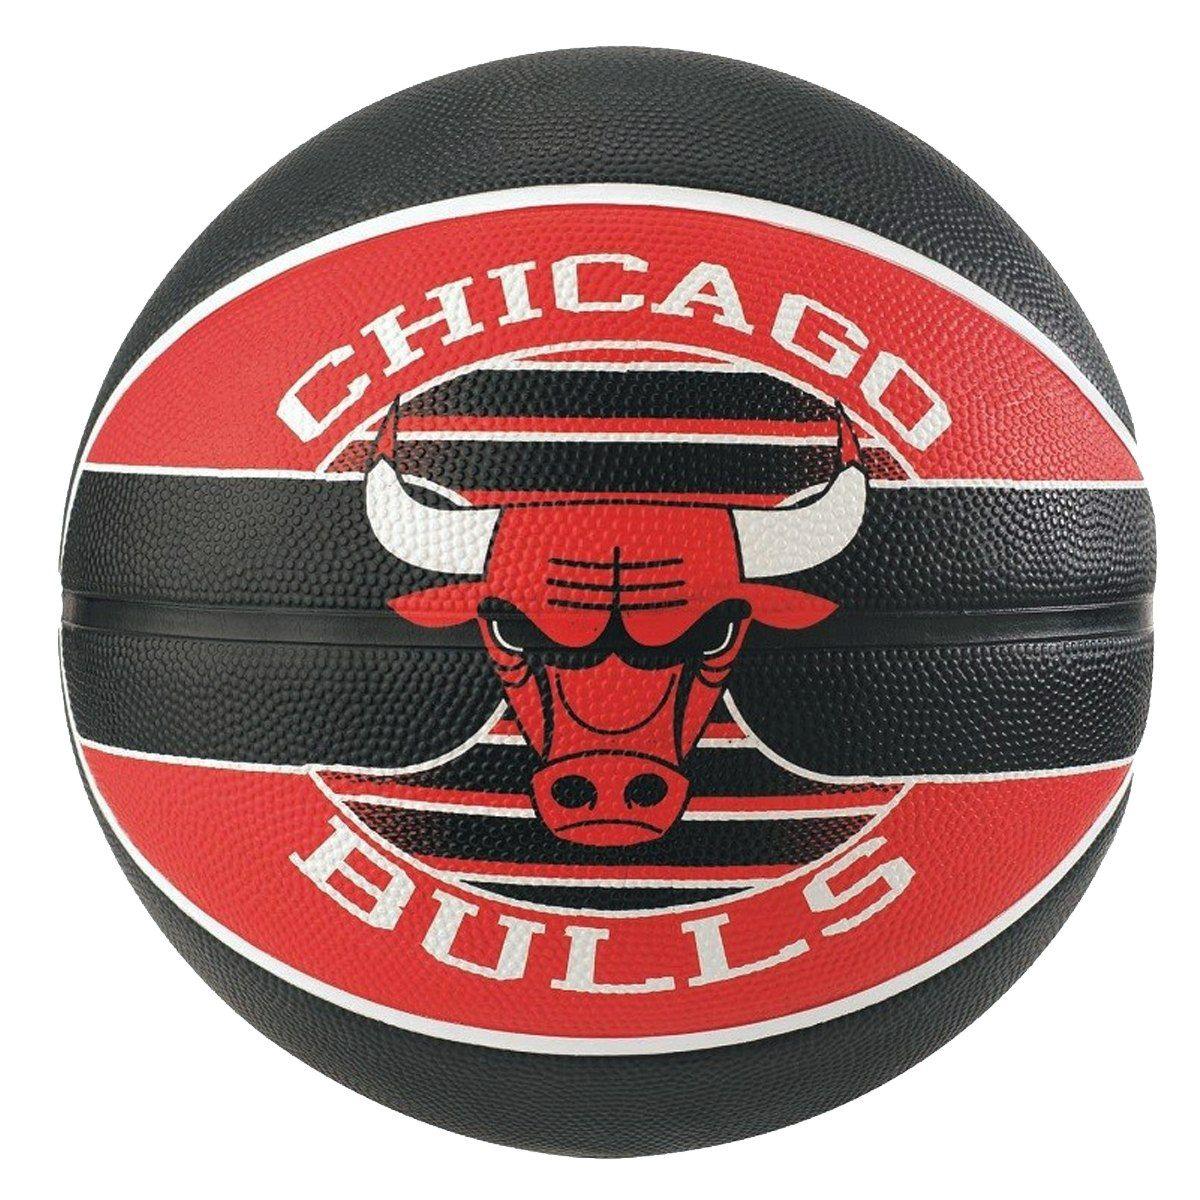 Bola Spalding  Basquete NBA Chicago Bulls - Pto/Vrm